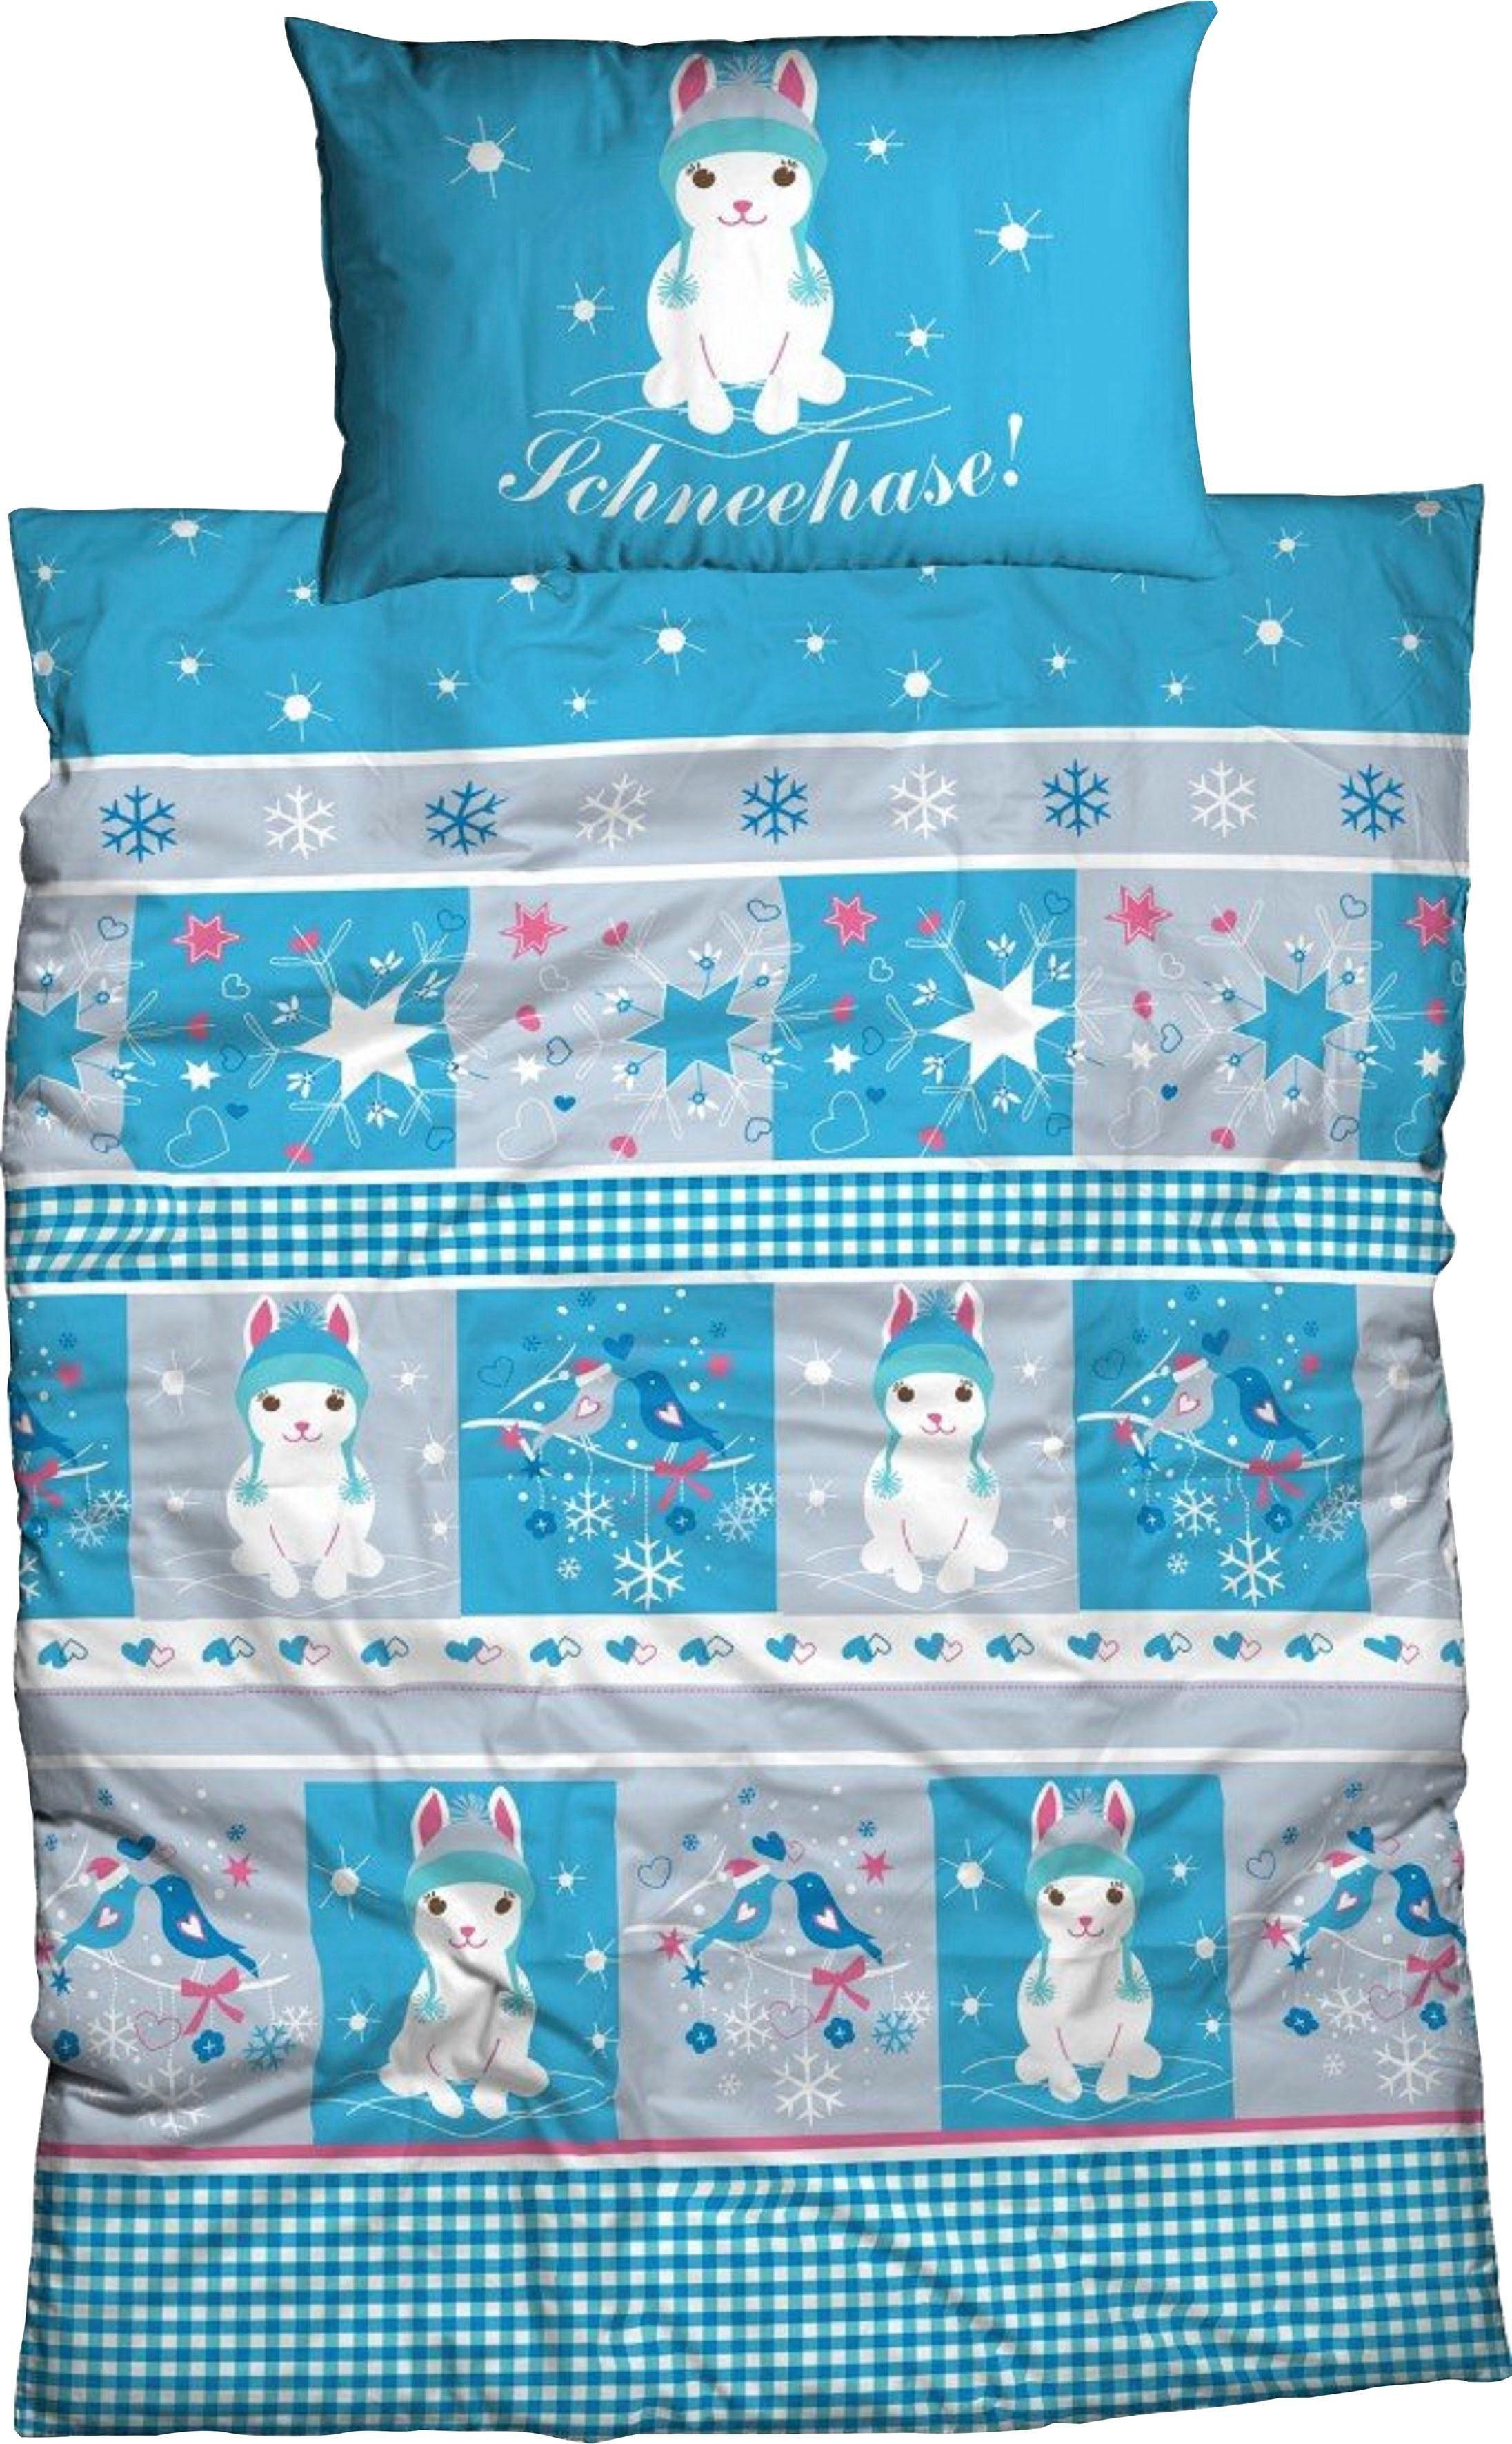 Kinderbettwäsche Schneehase ADELHEID | Kinderzimmer > Textilien für Kinder > Kinderbettwäsche | Blau | Adelheid